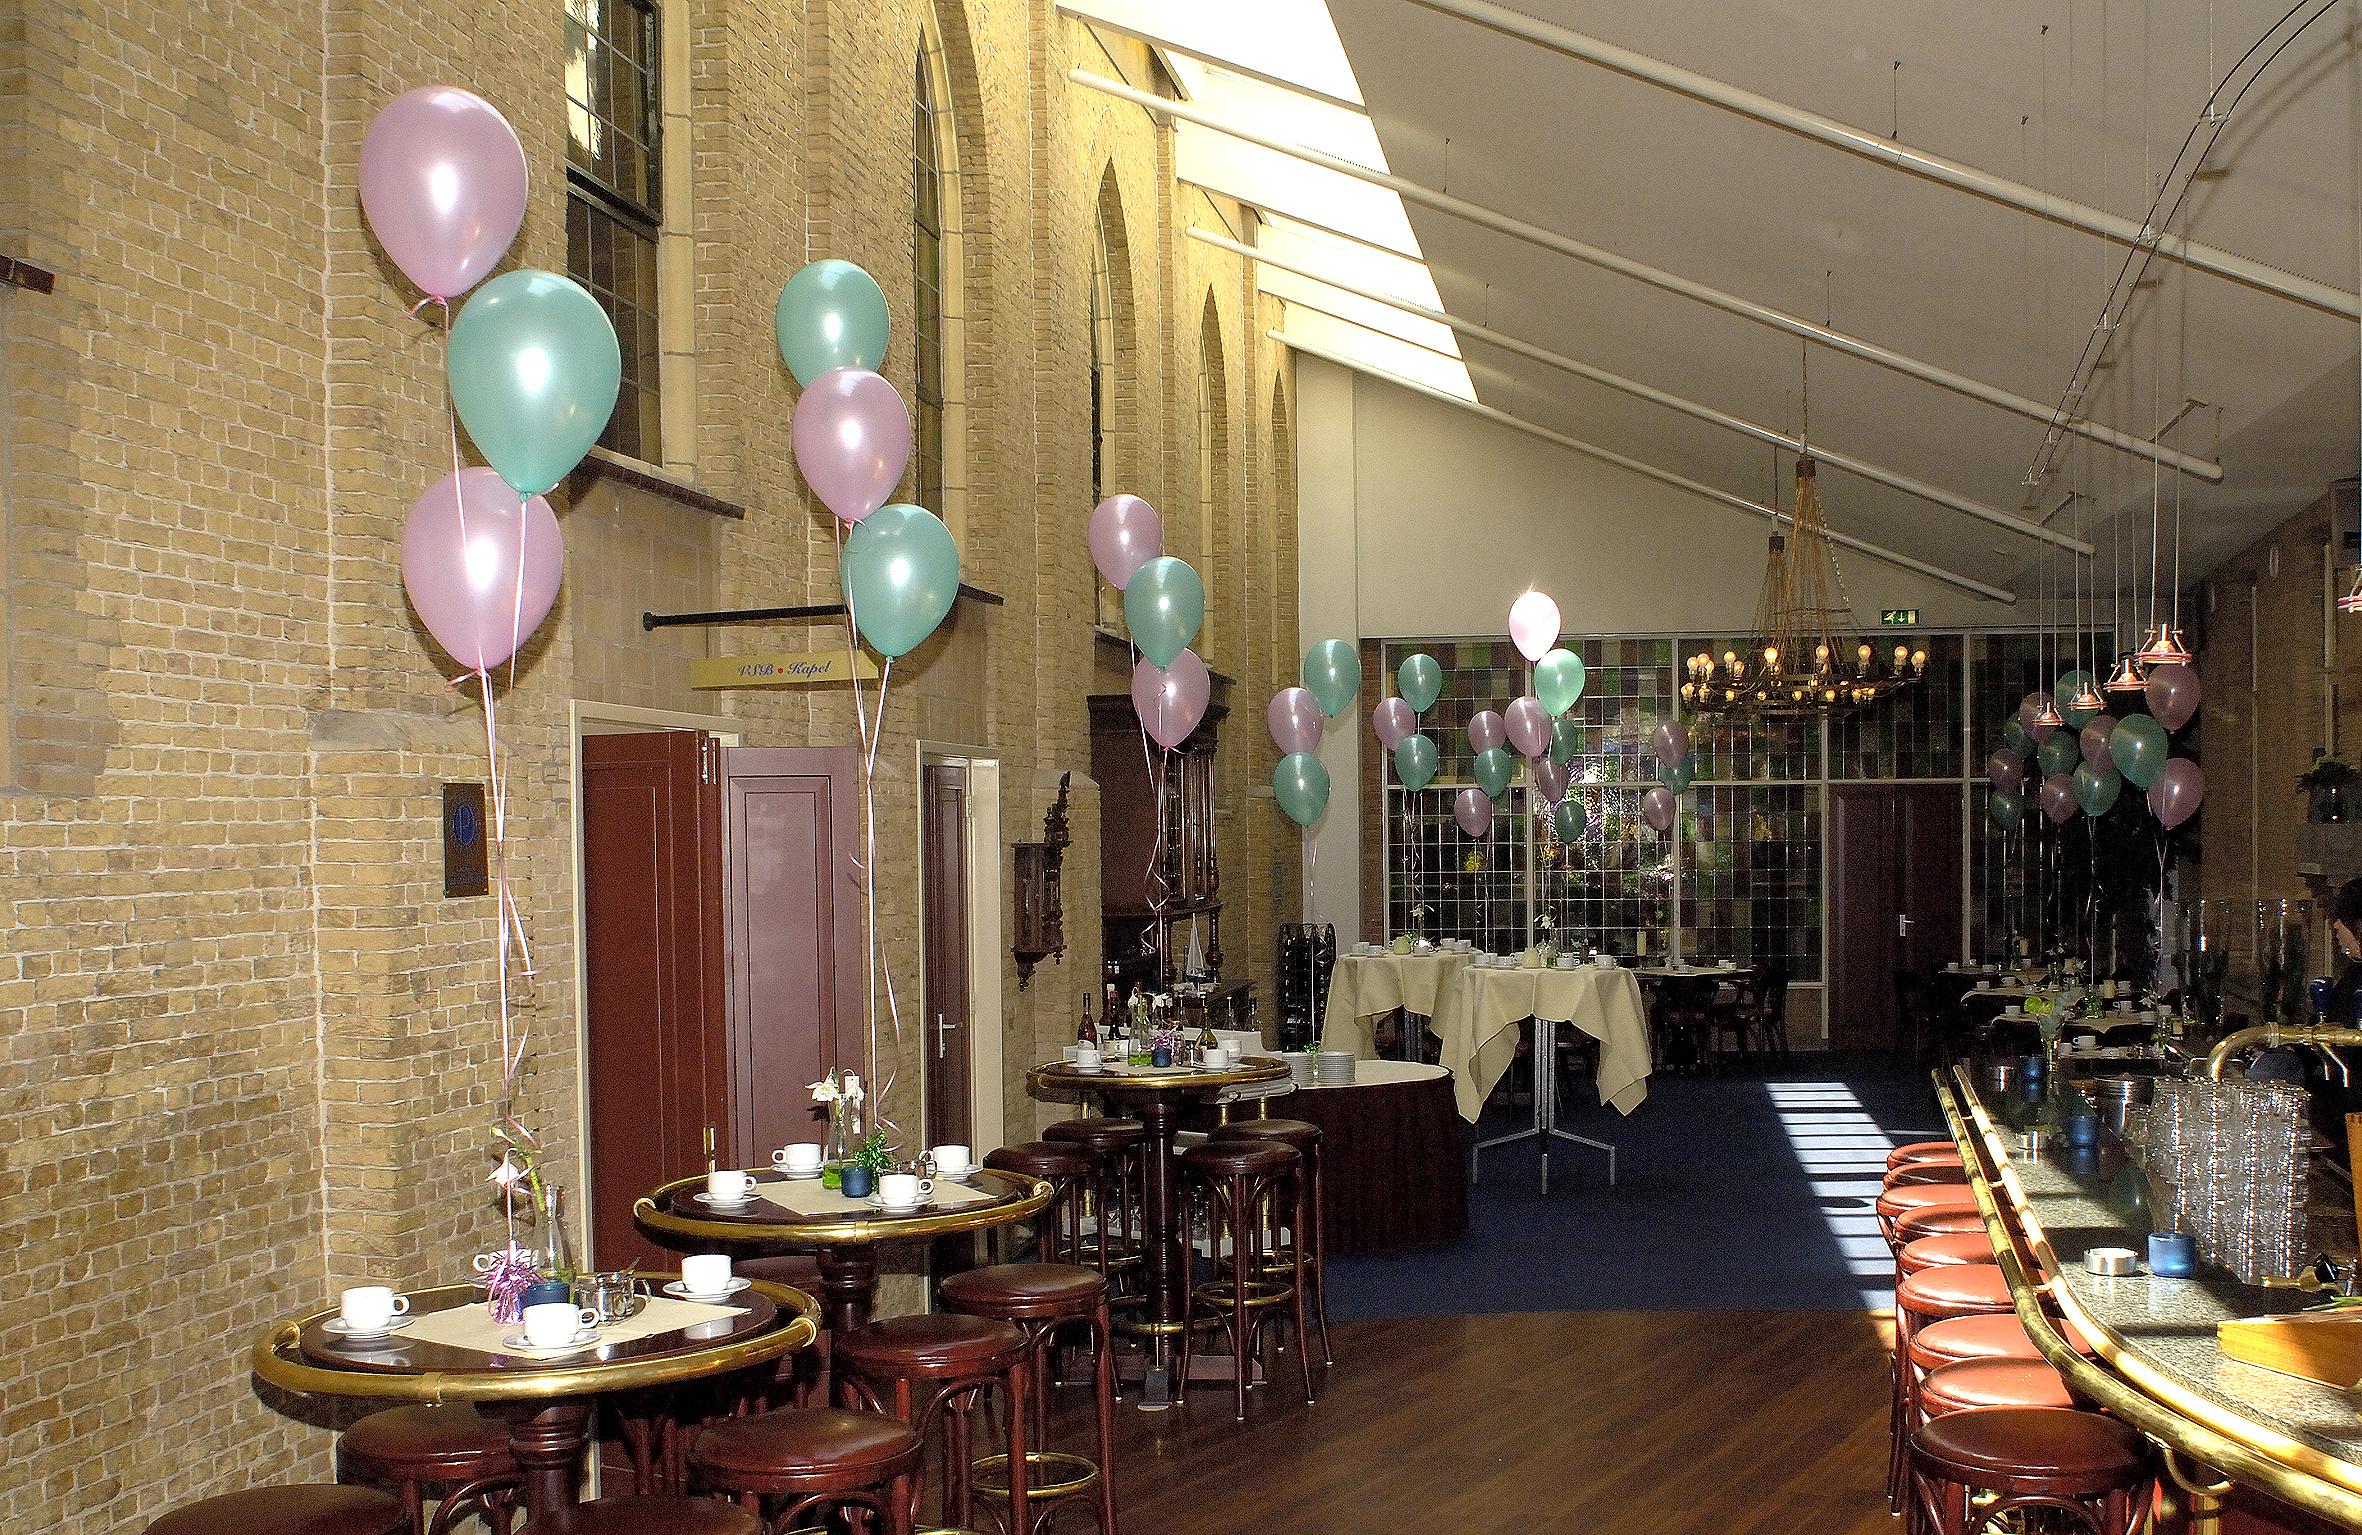 Ballonnendecoratie - Klein ballonset bestaande uit drie heliumballonnen